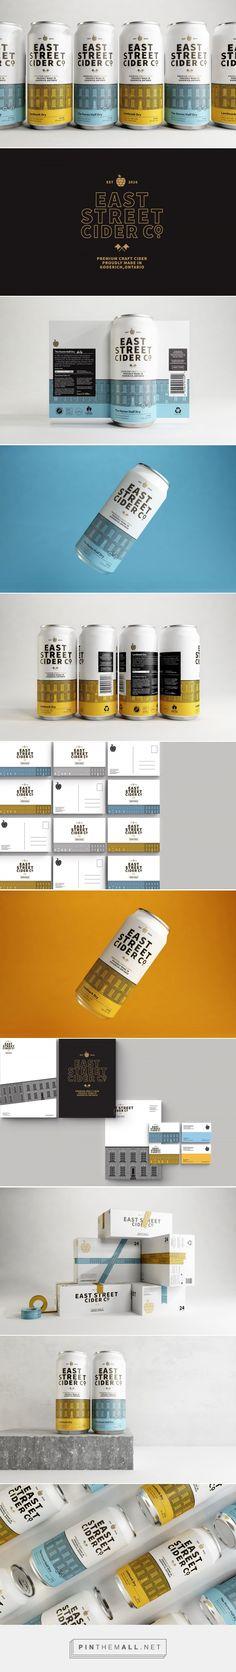 East Street Cider Co. packaging design by makebardo - https://www.packagingoftheworld.com/2018/06/east-street-cider-co.html